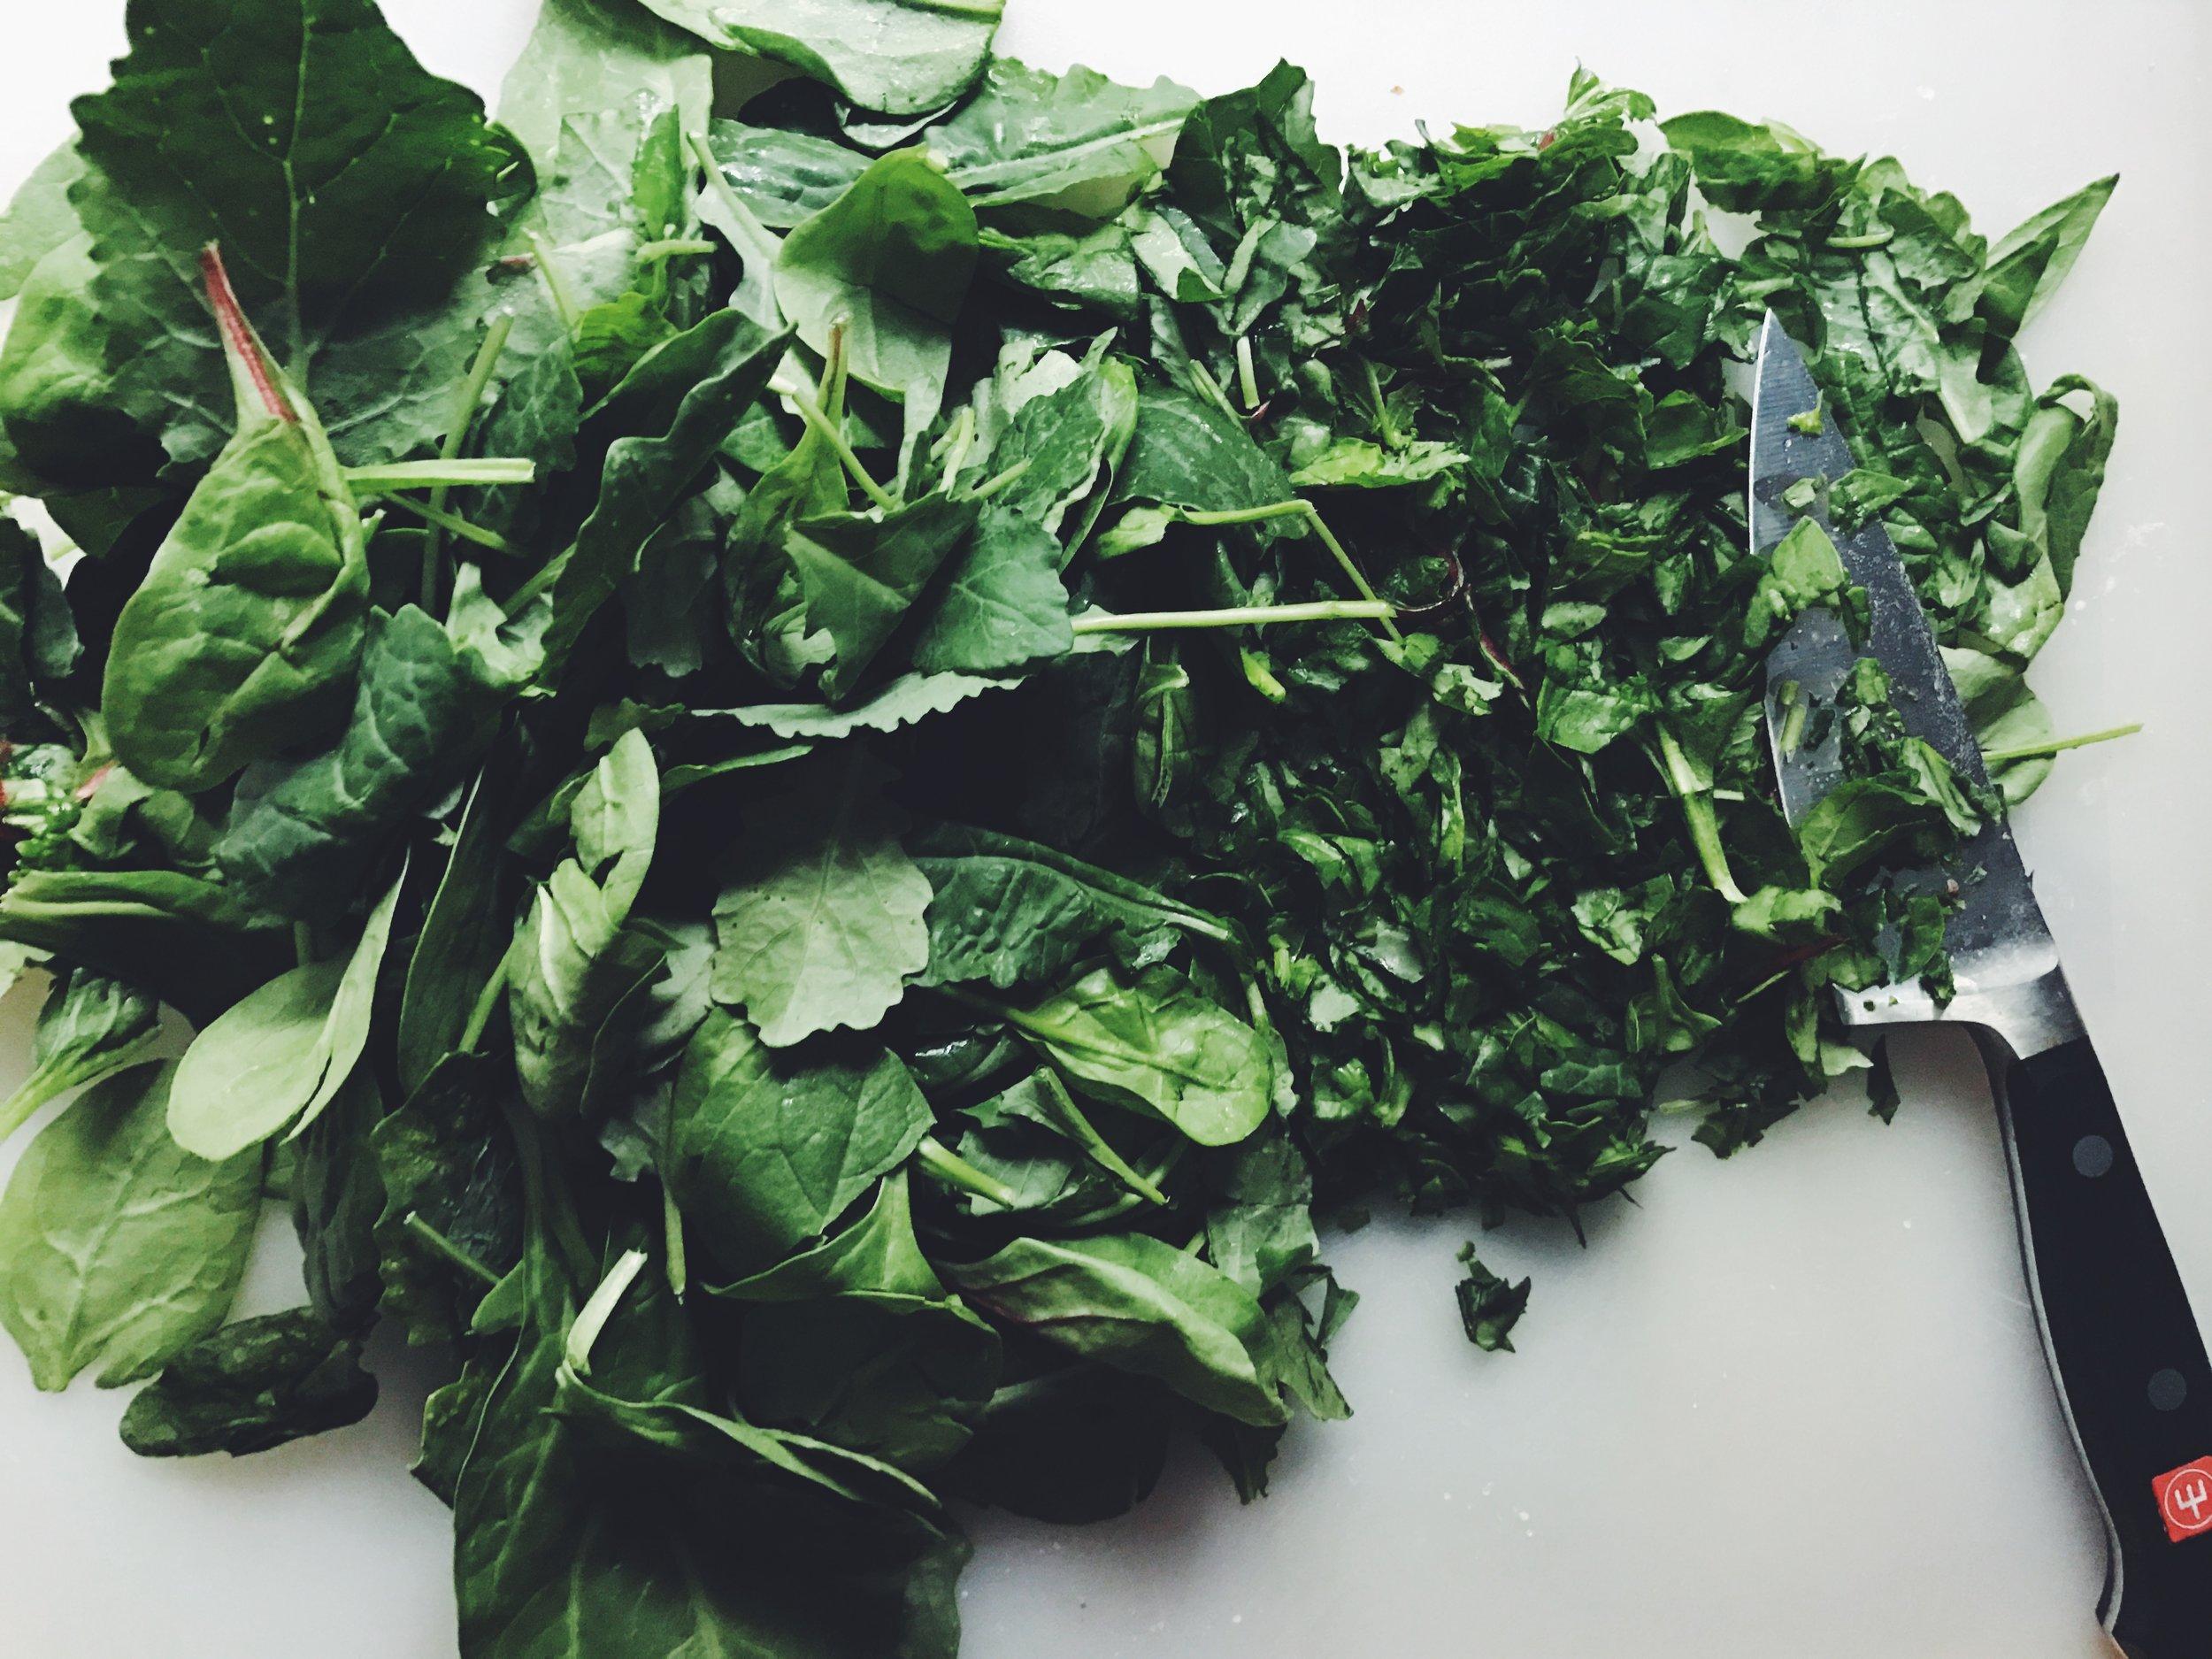 shredding kale